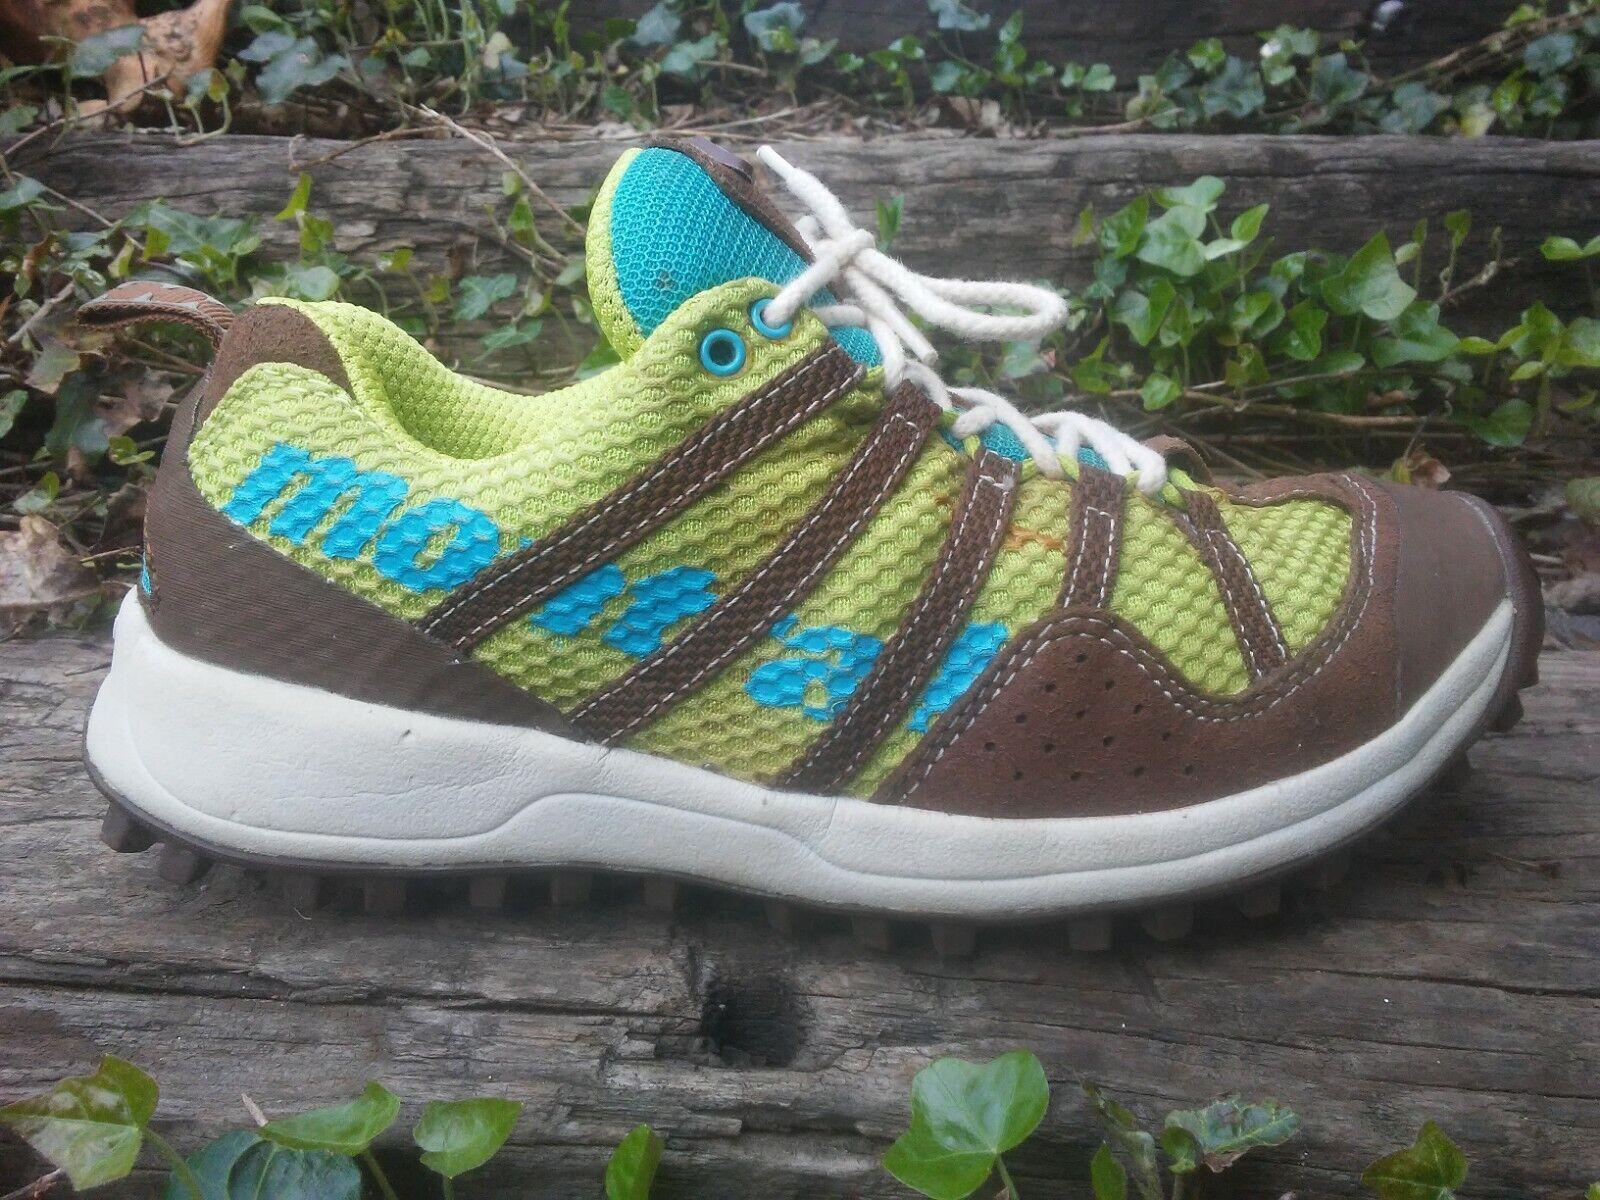 Women's Montrail Highlander Trail Running shoes bluee Green Size 6.5